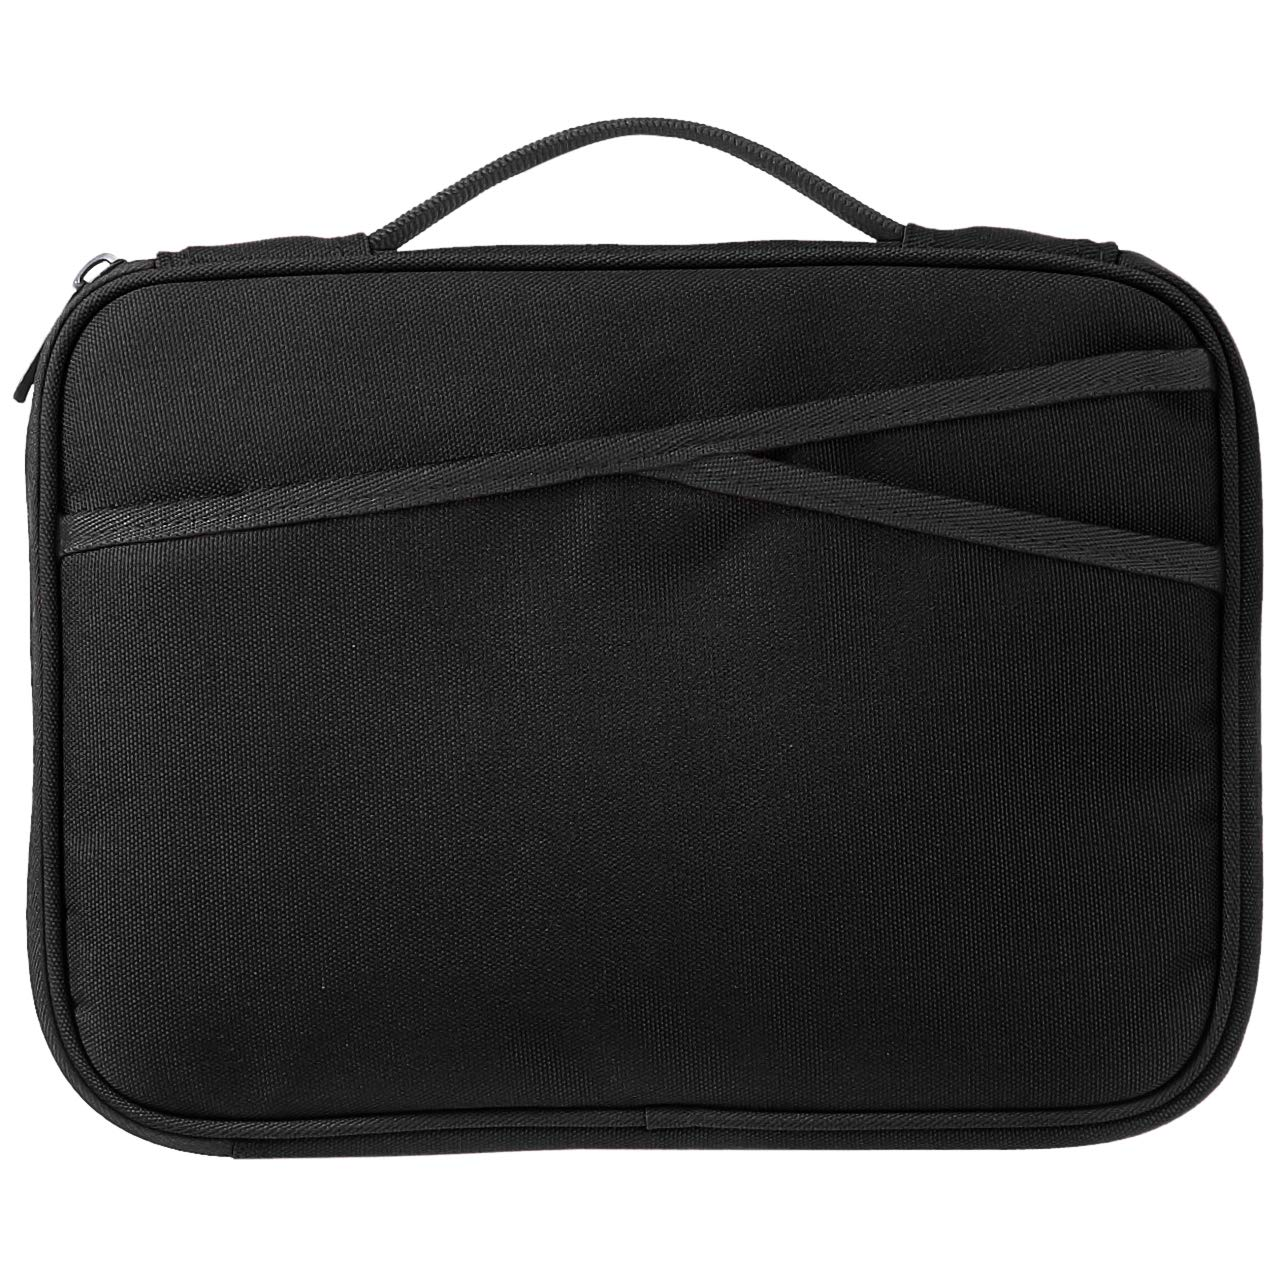 AmazonBasics Tablet Sleeve Case Bag - 10-Inch, Black